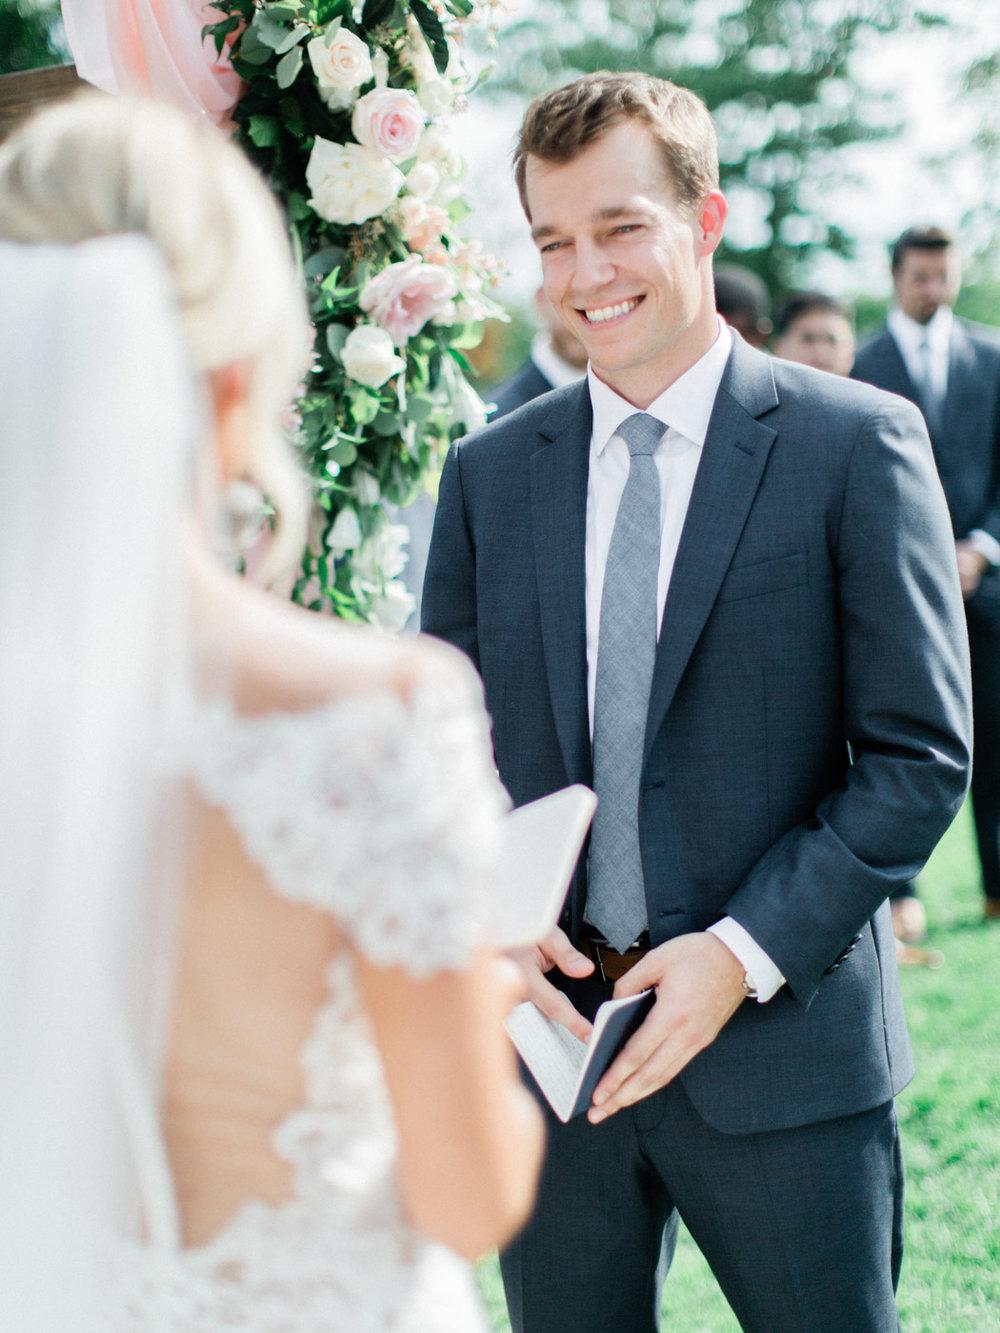 Toronto-Muskoka-wedding-photographer-summery-fun-documentary-the-marriott-rosseau85.jpg